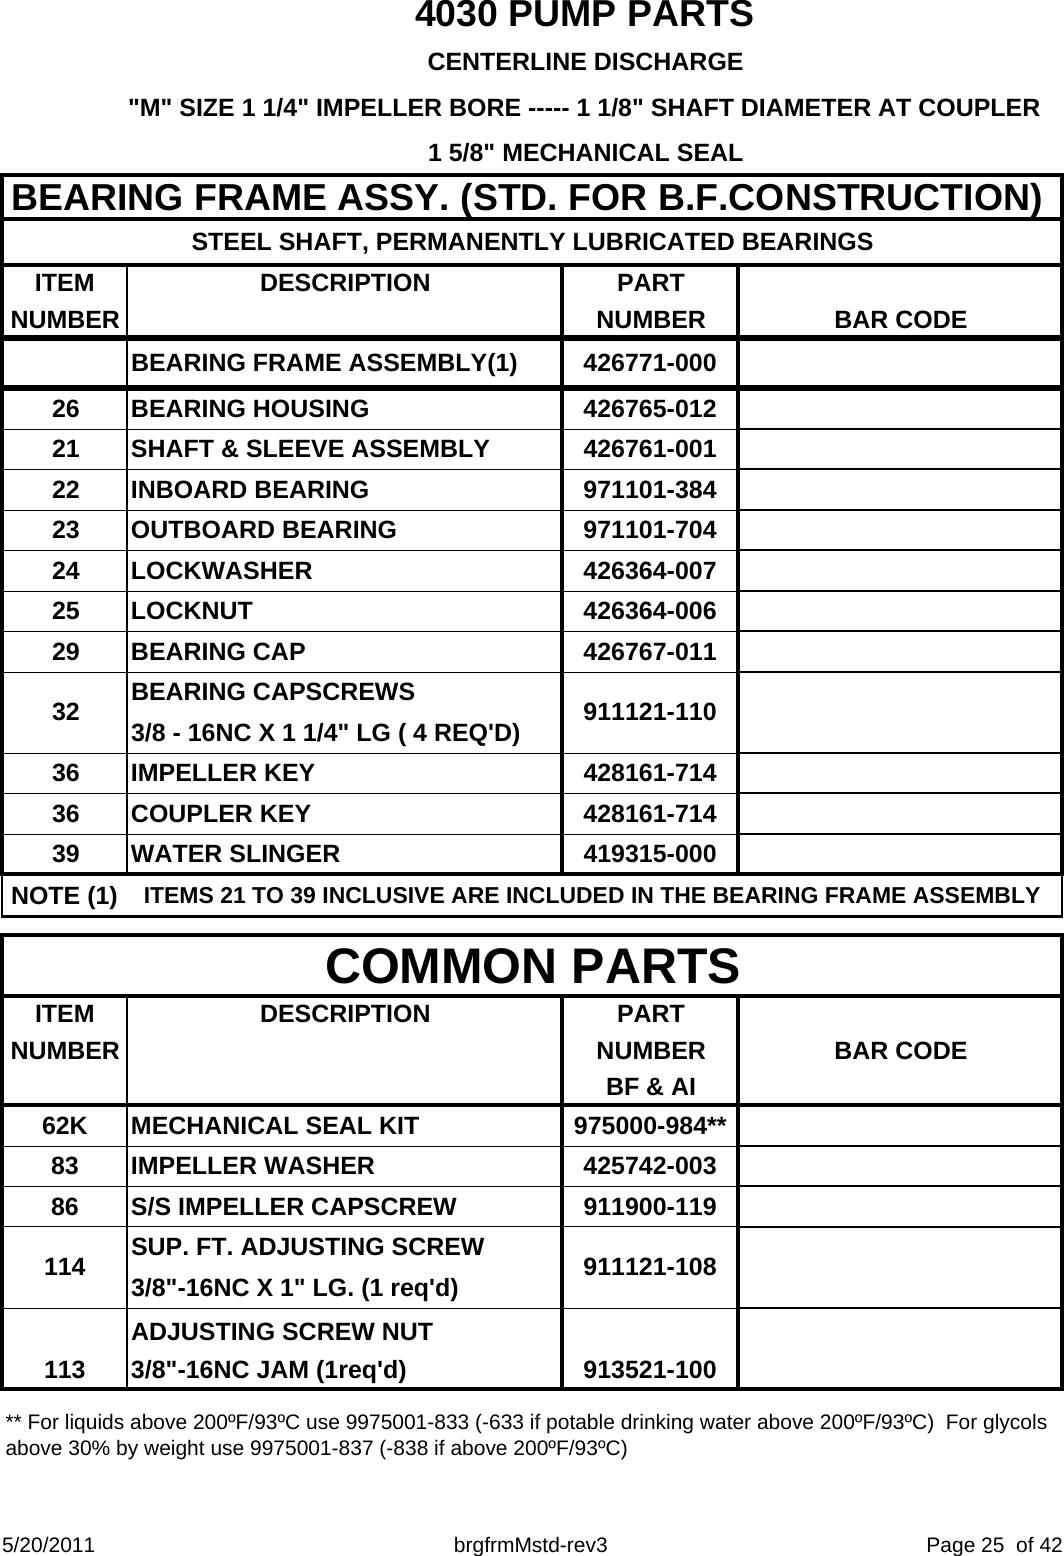 537853 1 Armstrong 4030 M Series Repair Parts 6040 121